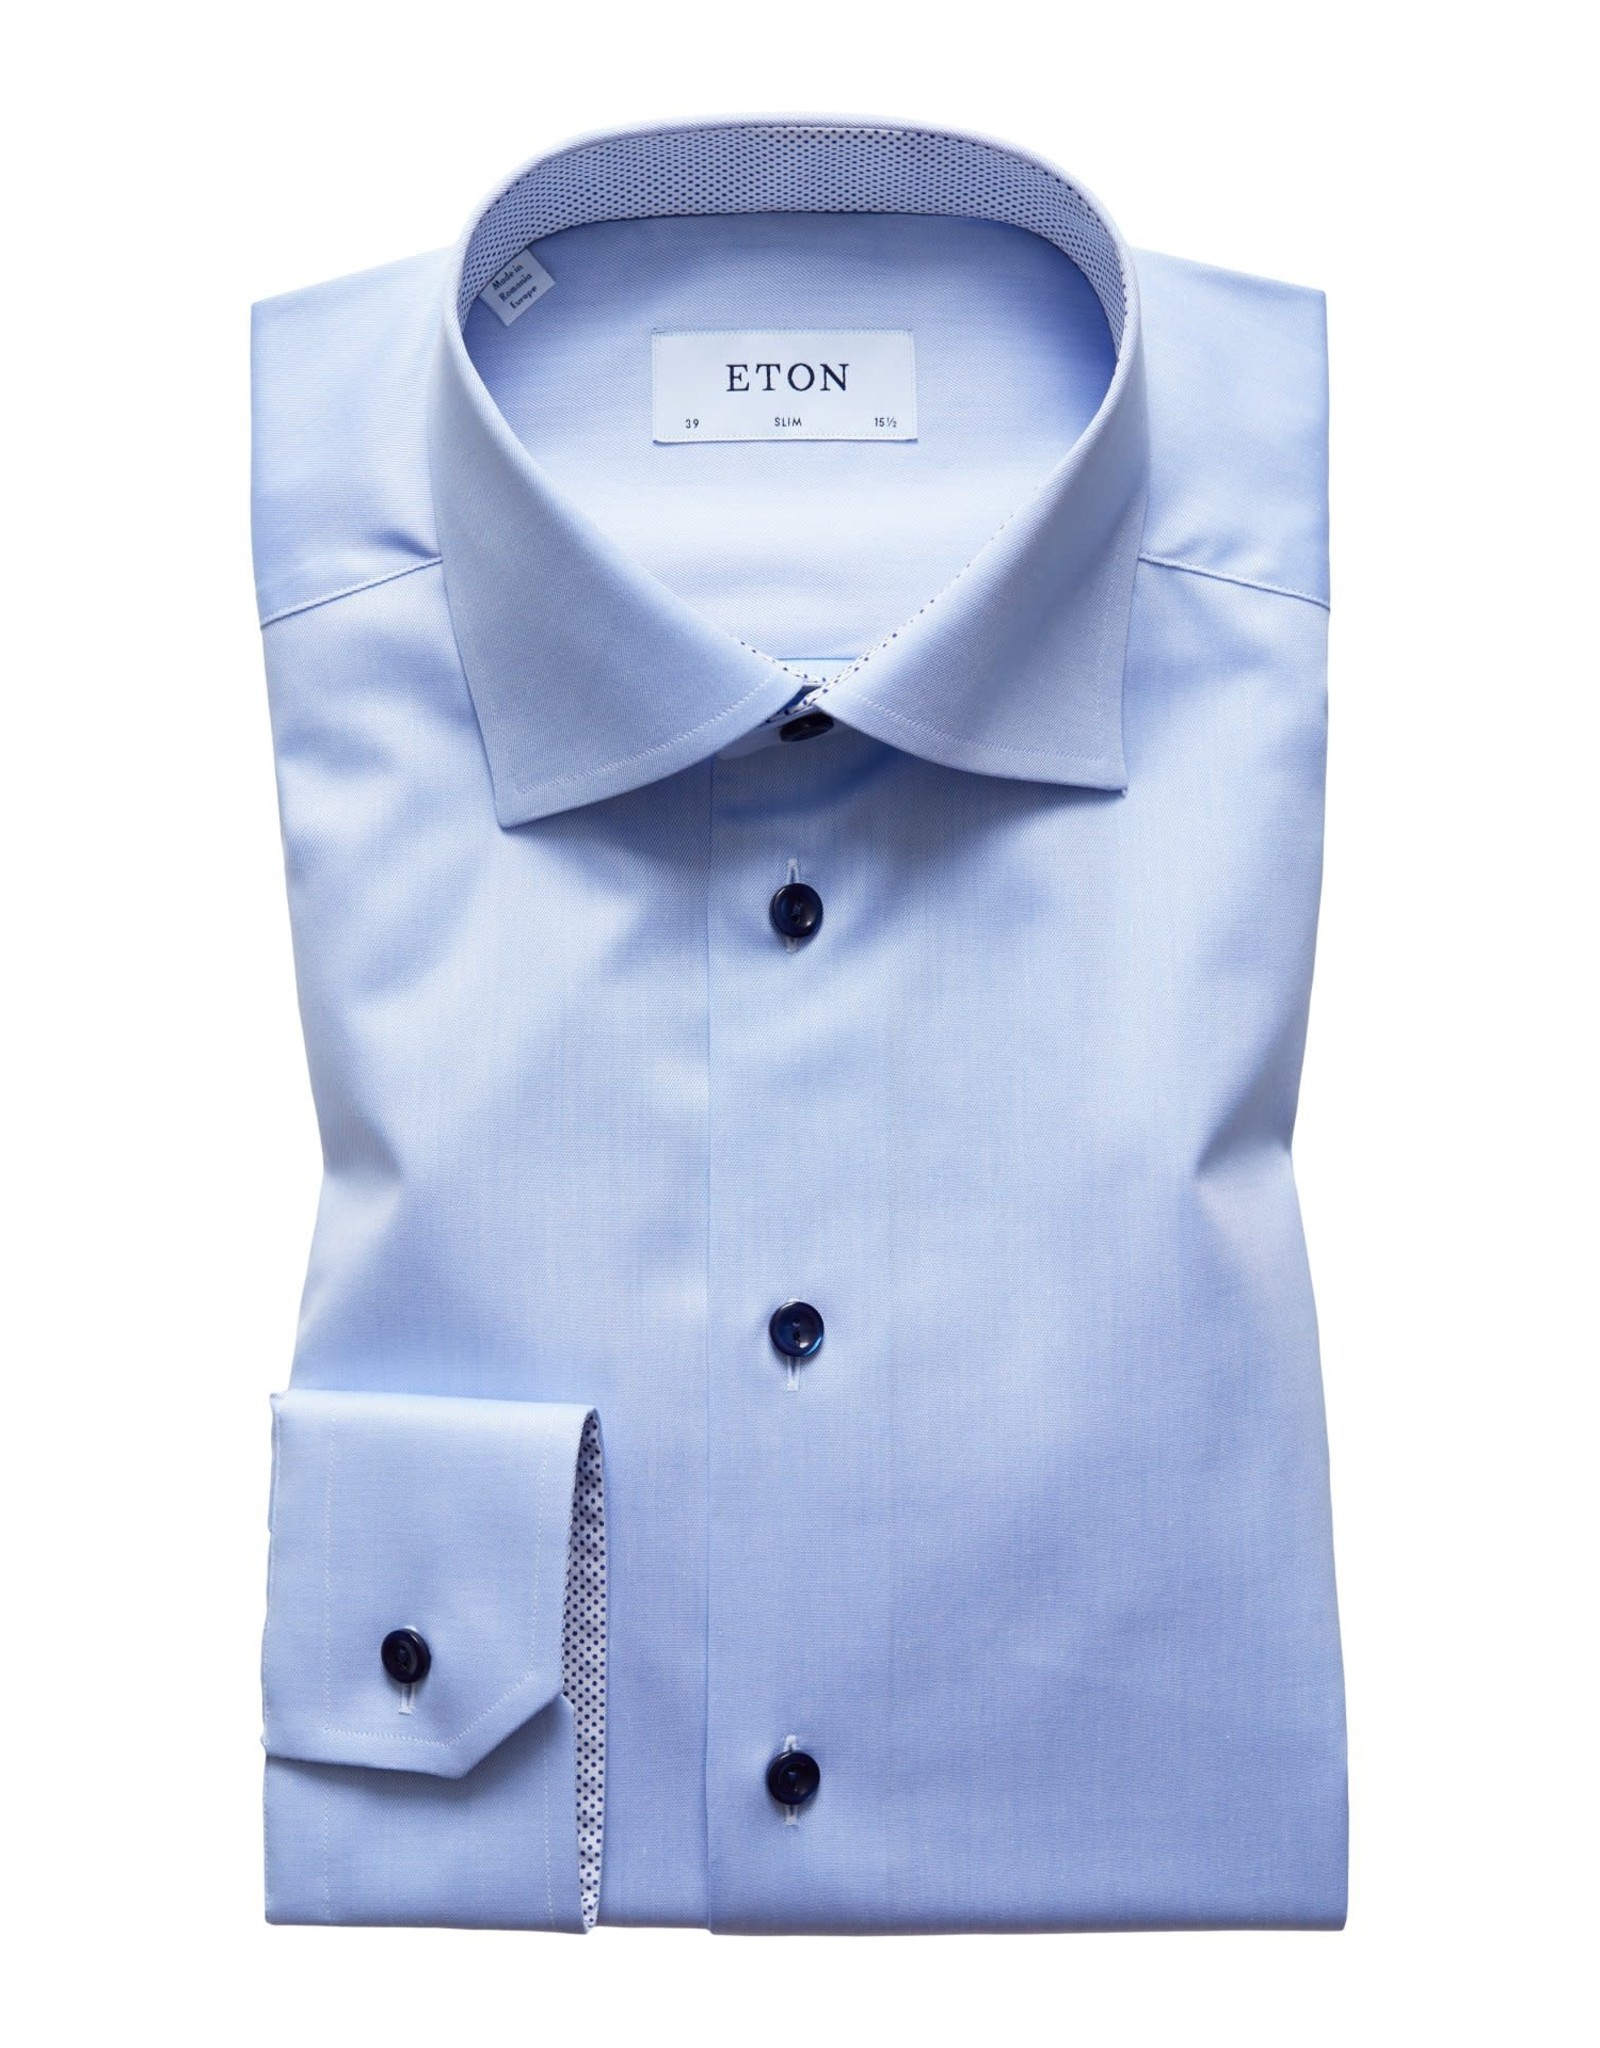 Eton Eton hemd blauw contemporary  3000-00361/21